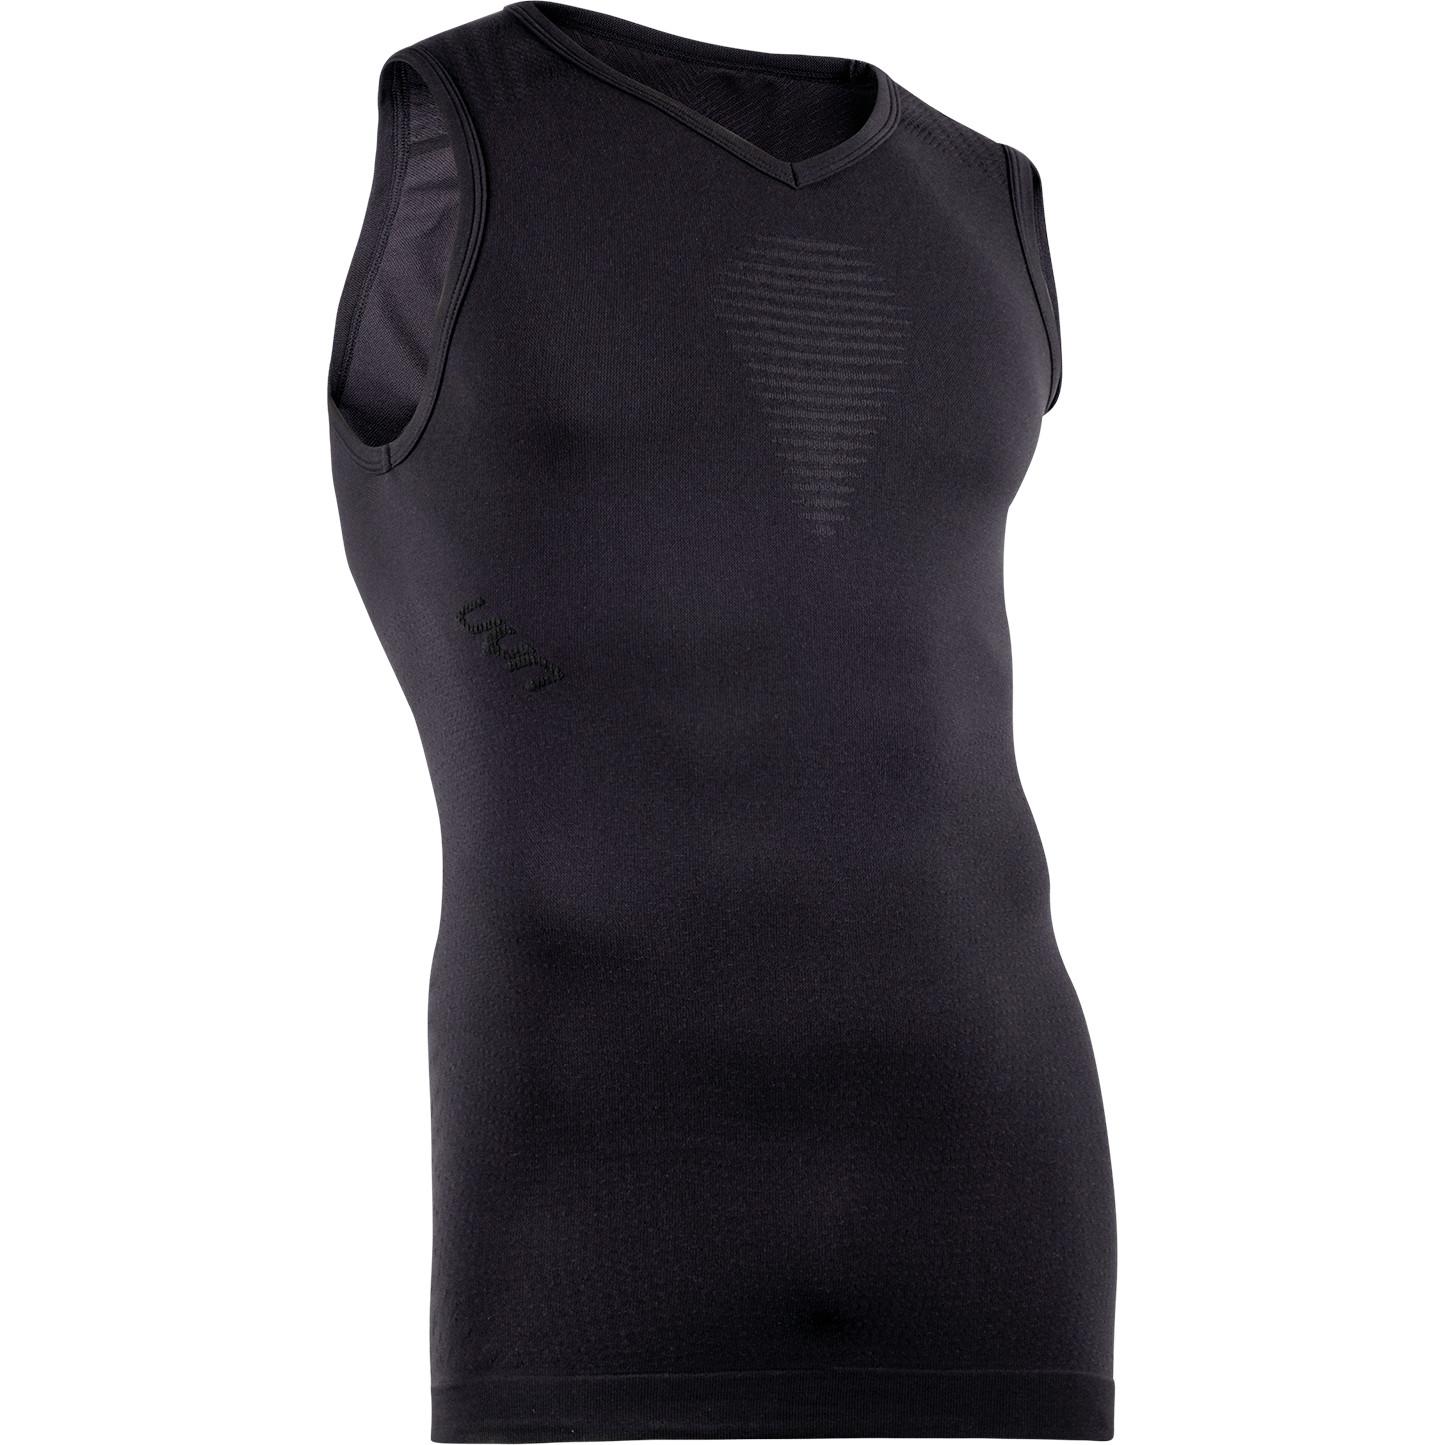 Bild von UYN Visyon Light 2.0 Underwear Ärmelloses Shirt - Blackboard